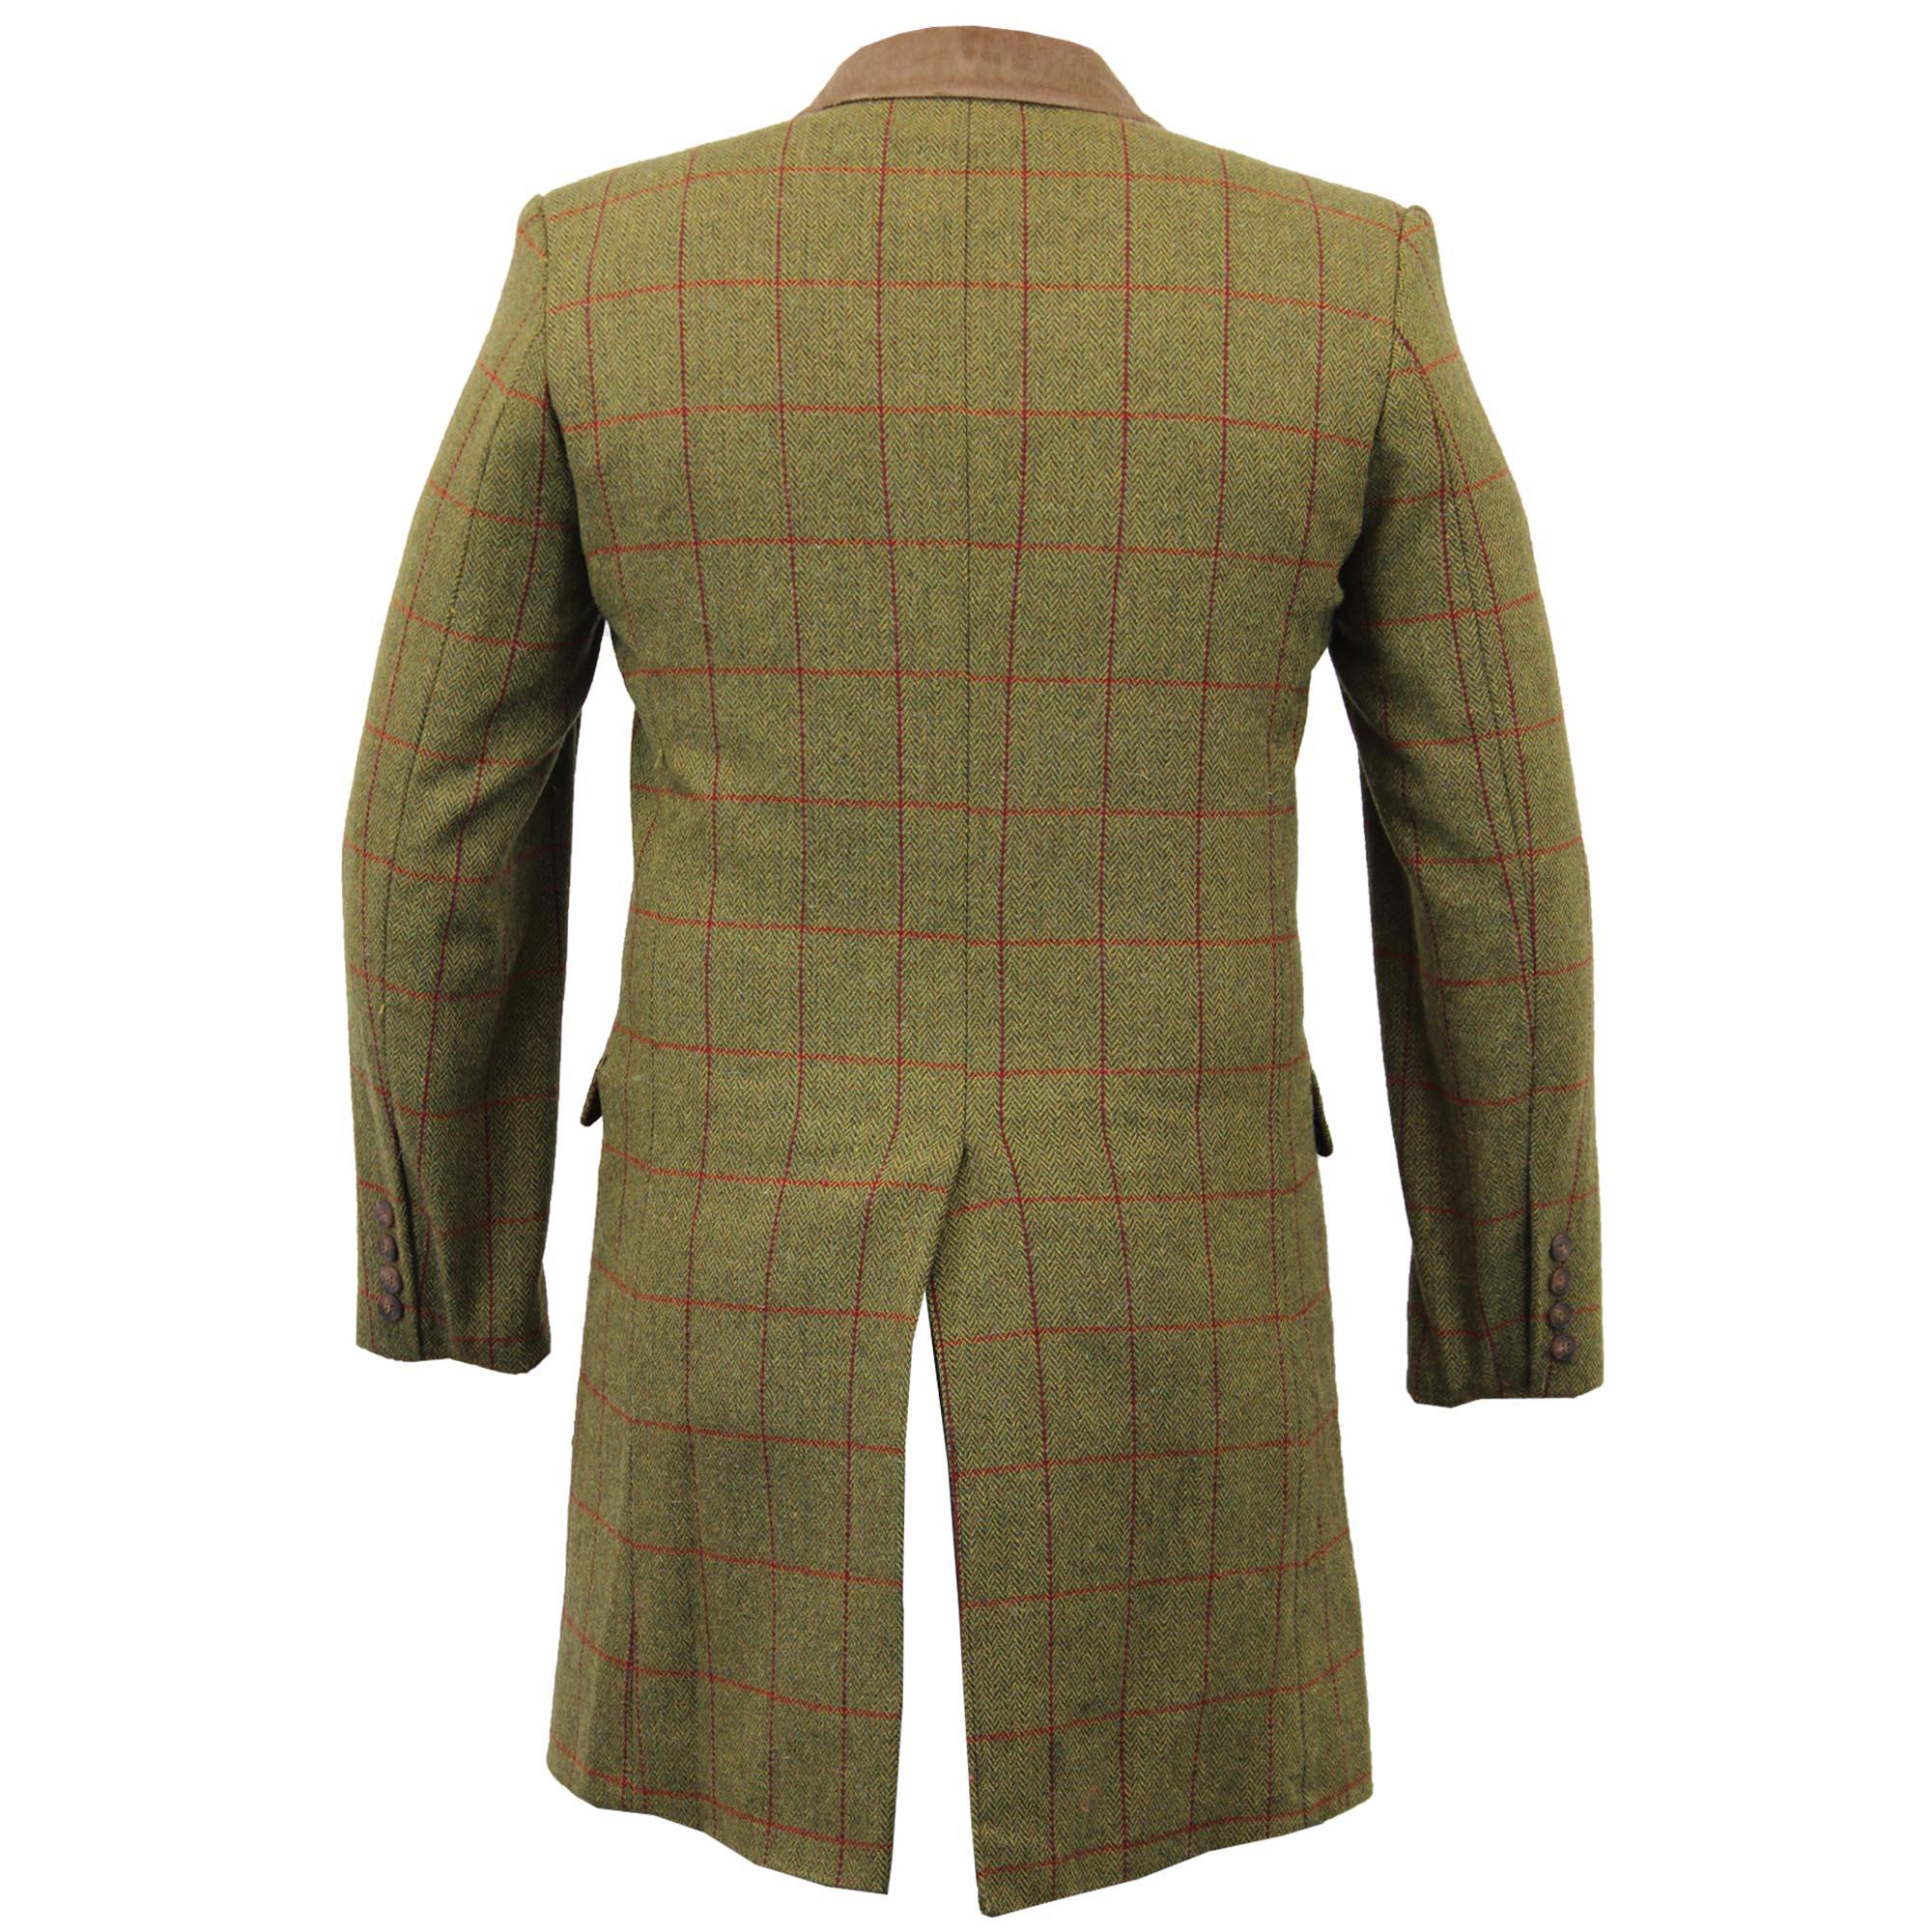 Mens-Wool-Mix-Trench-Coat-Checked-Jacket-Herringbone-Tweed-Overcoat-Lined-Winter thumbnail 15